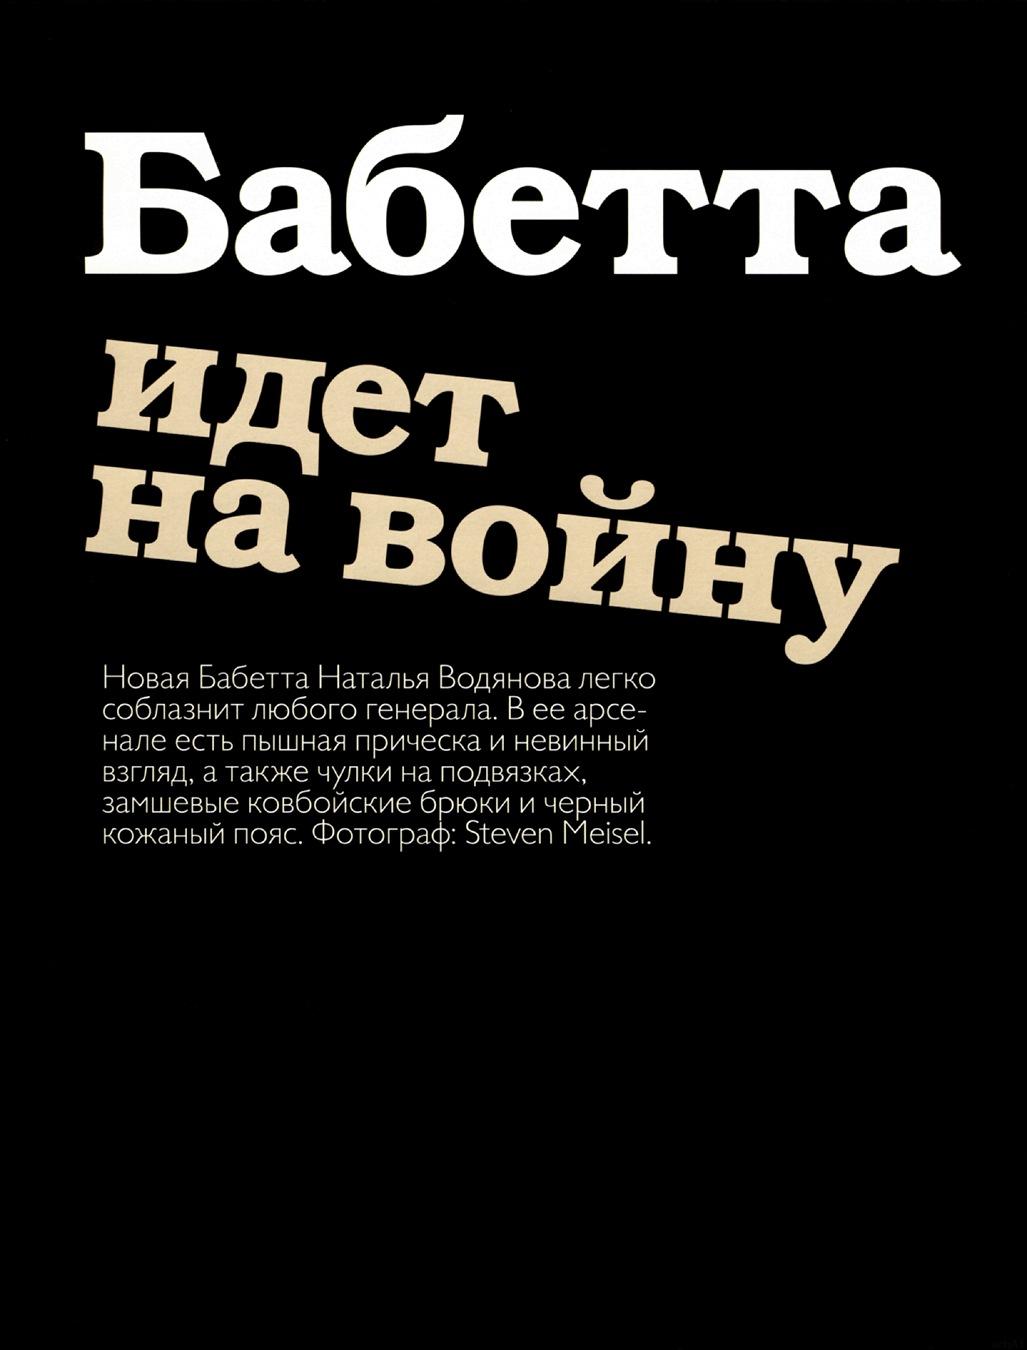 13088_at_vogue-ru_2008-03_p485_123_464lo.jpg